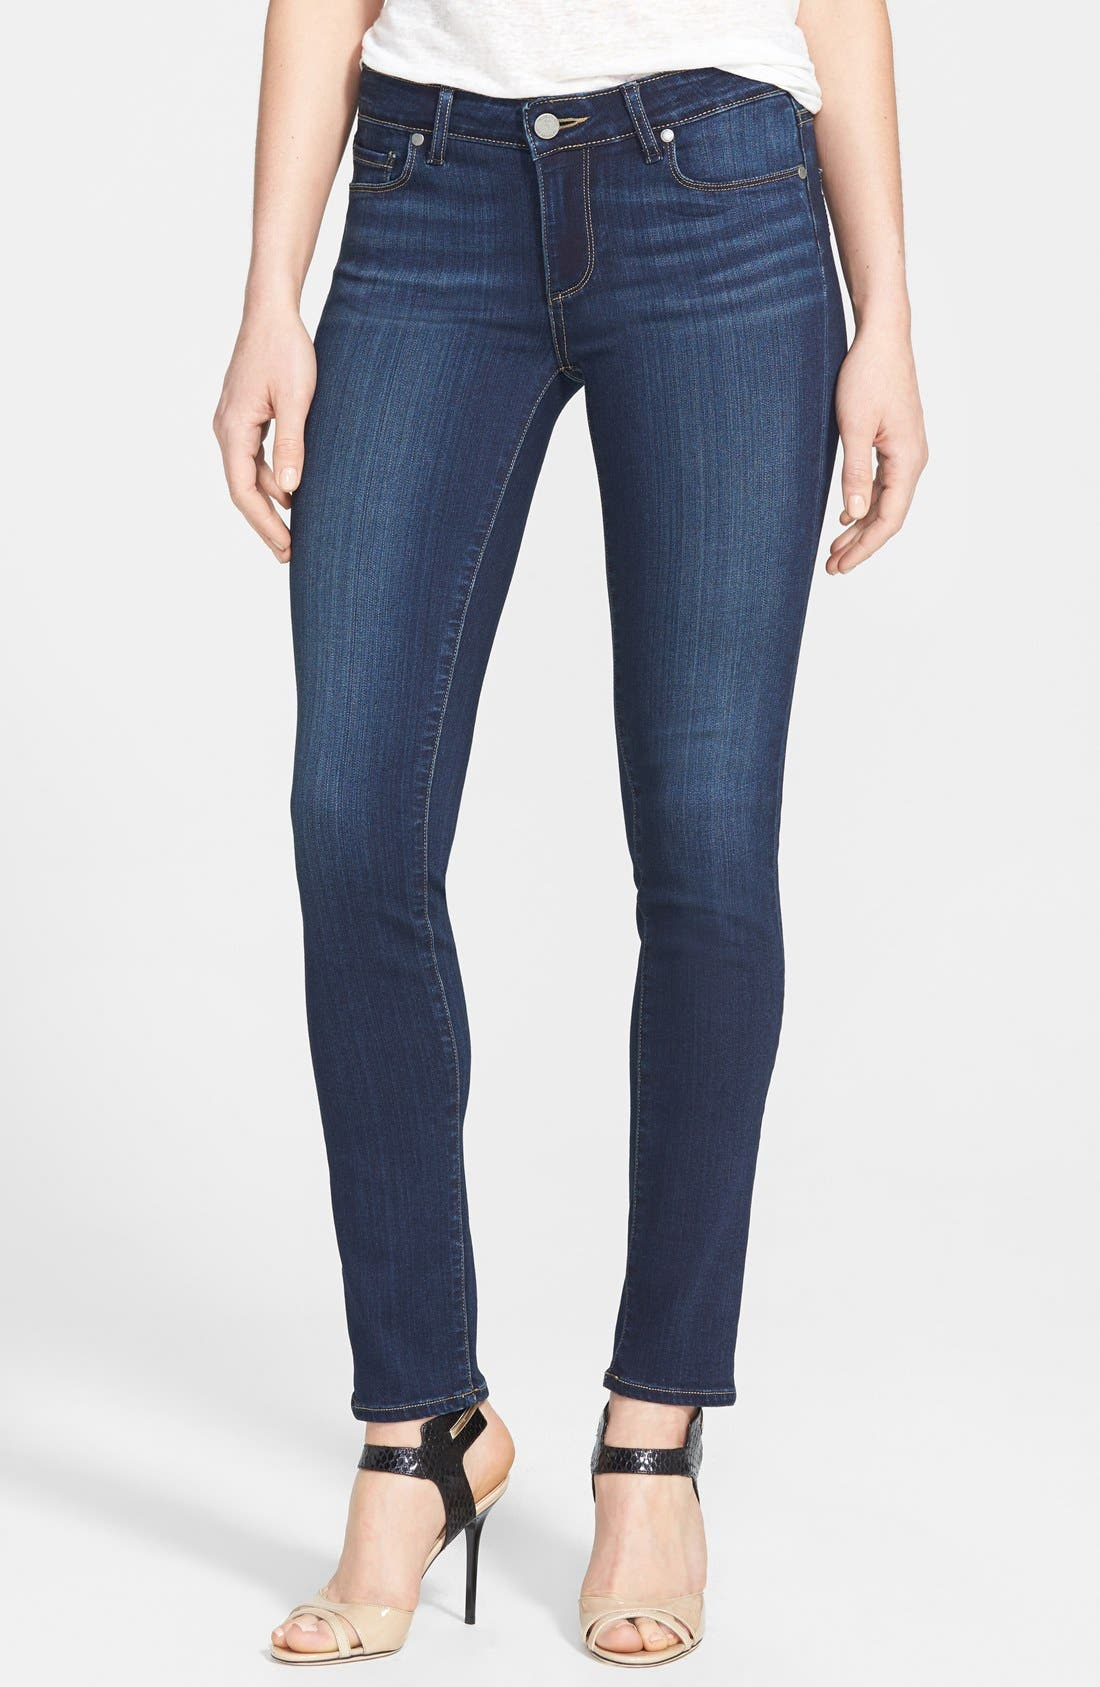 Paige Denim 'Skyline' Skinny Jeans (Nottingham)